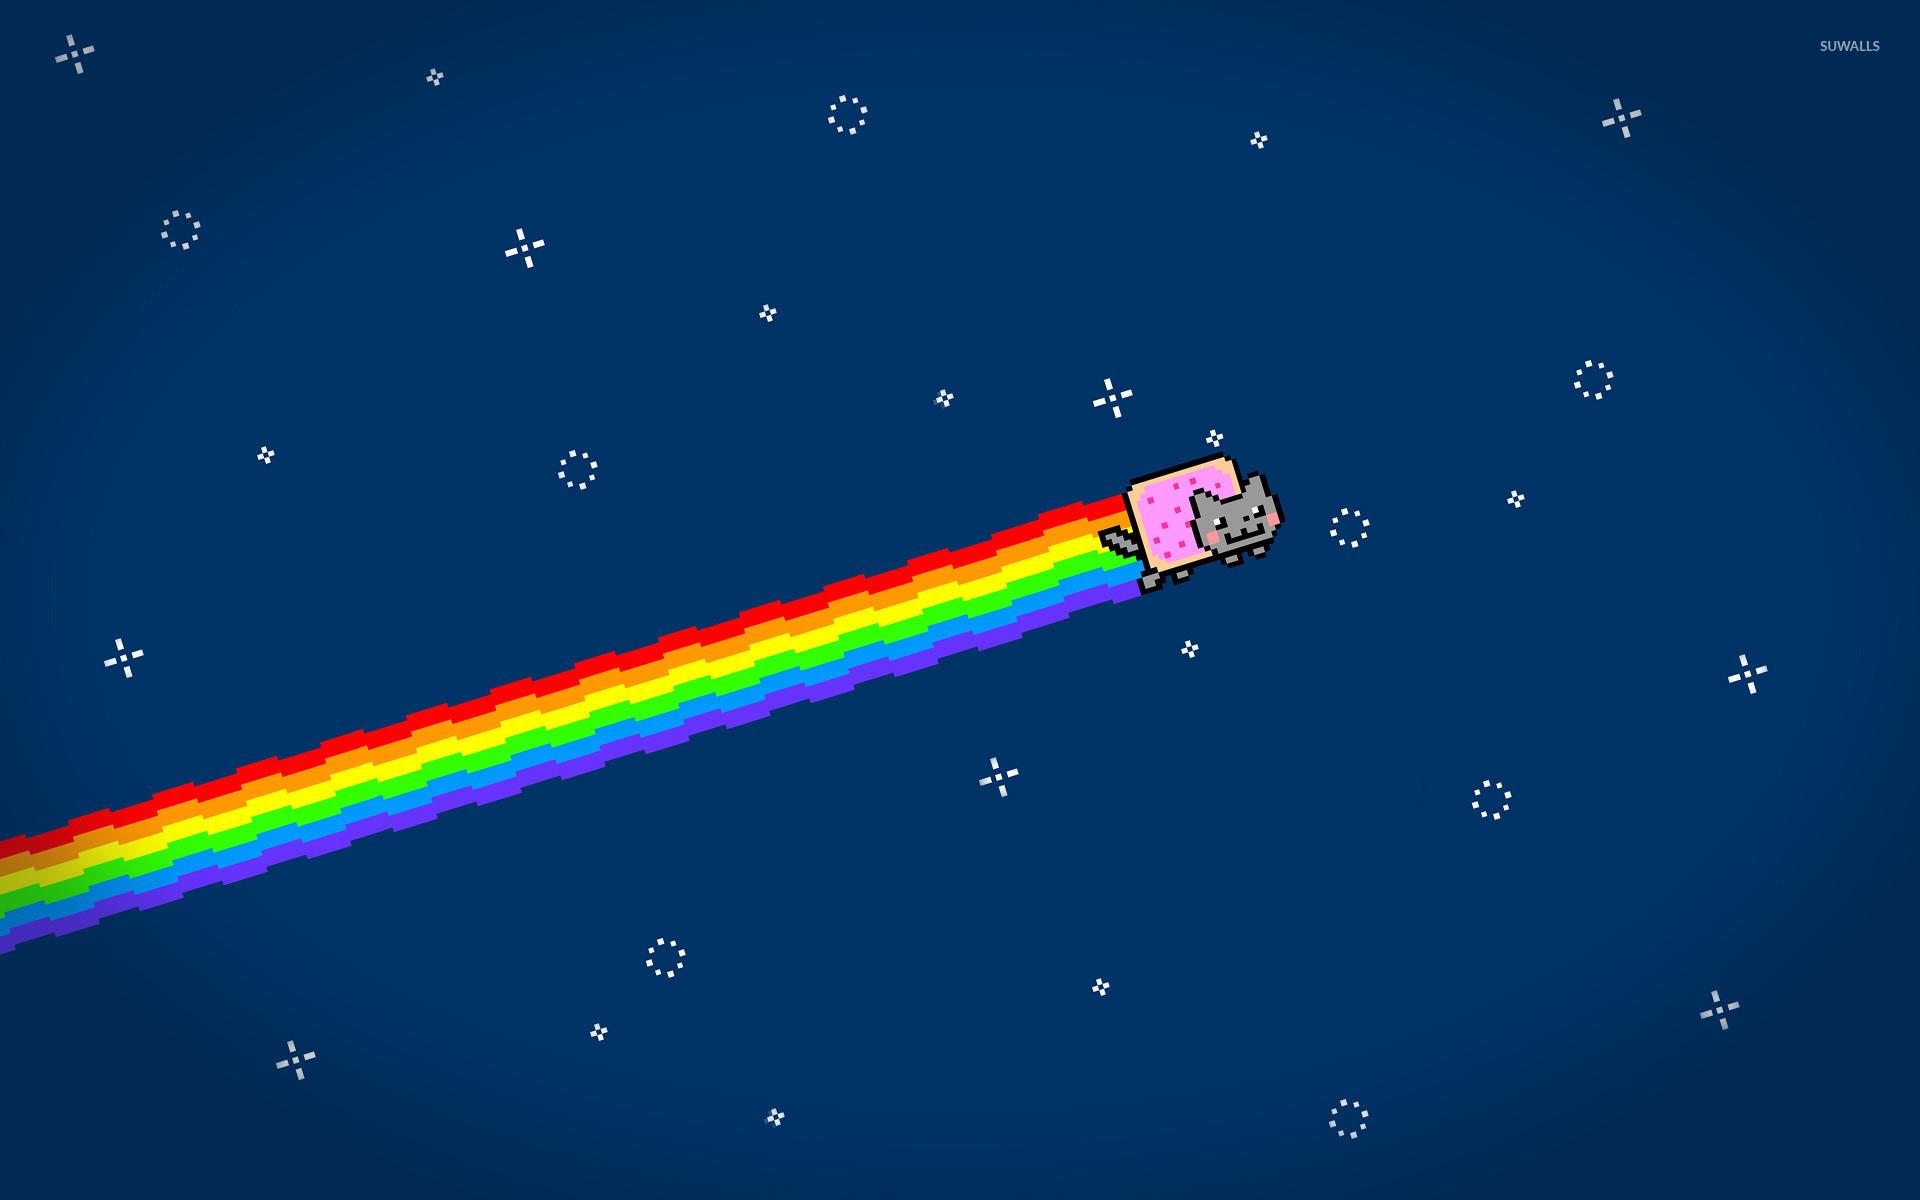 Nyan Cat flying wallpaper